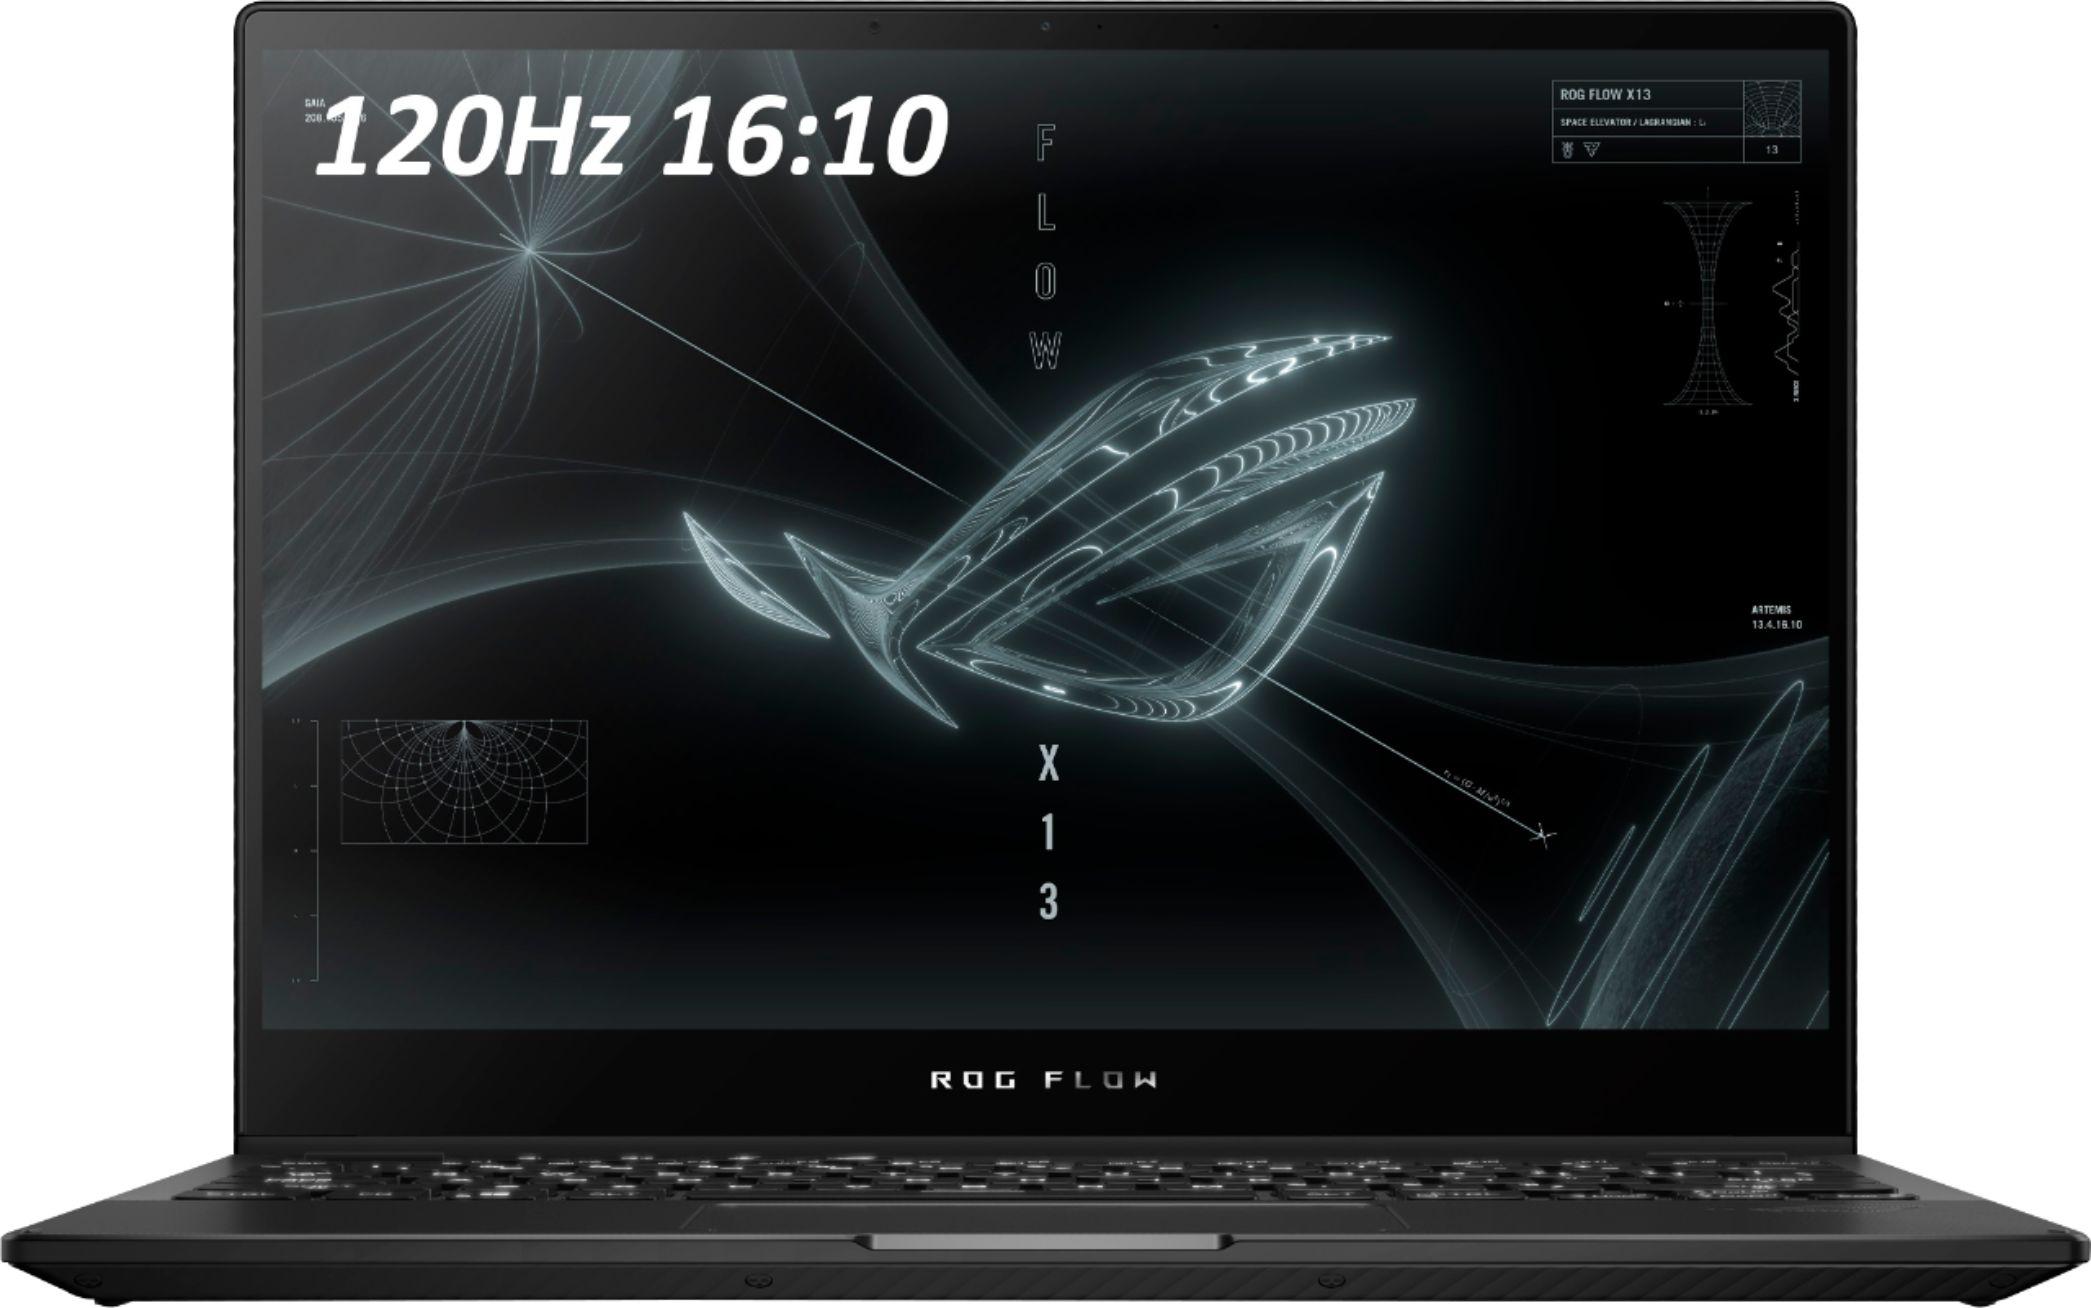 "ASUS - ROG 13.4"" Touchscreen Gaming Laptop - AMD Ryzen 9 - 16GB Memory - NVIDIA RTX3050 Ti V4G Graphics - 1TB SSD $1400"